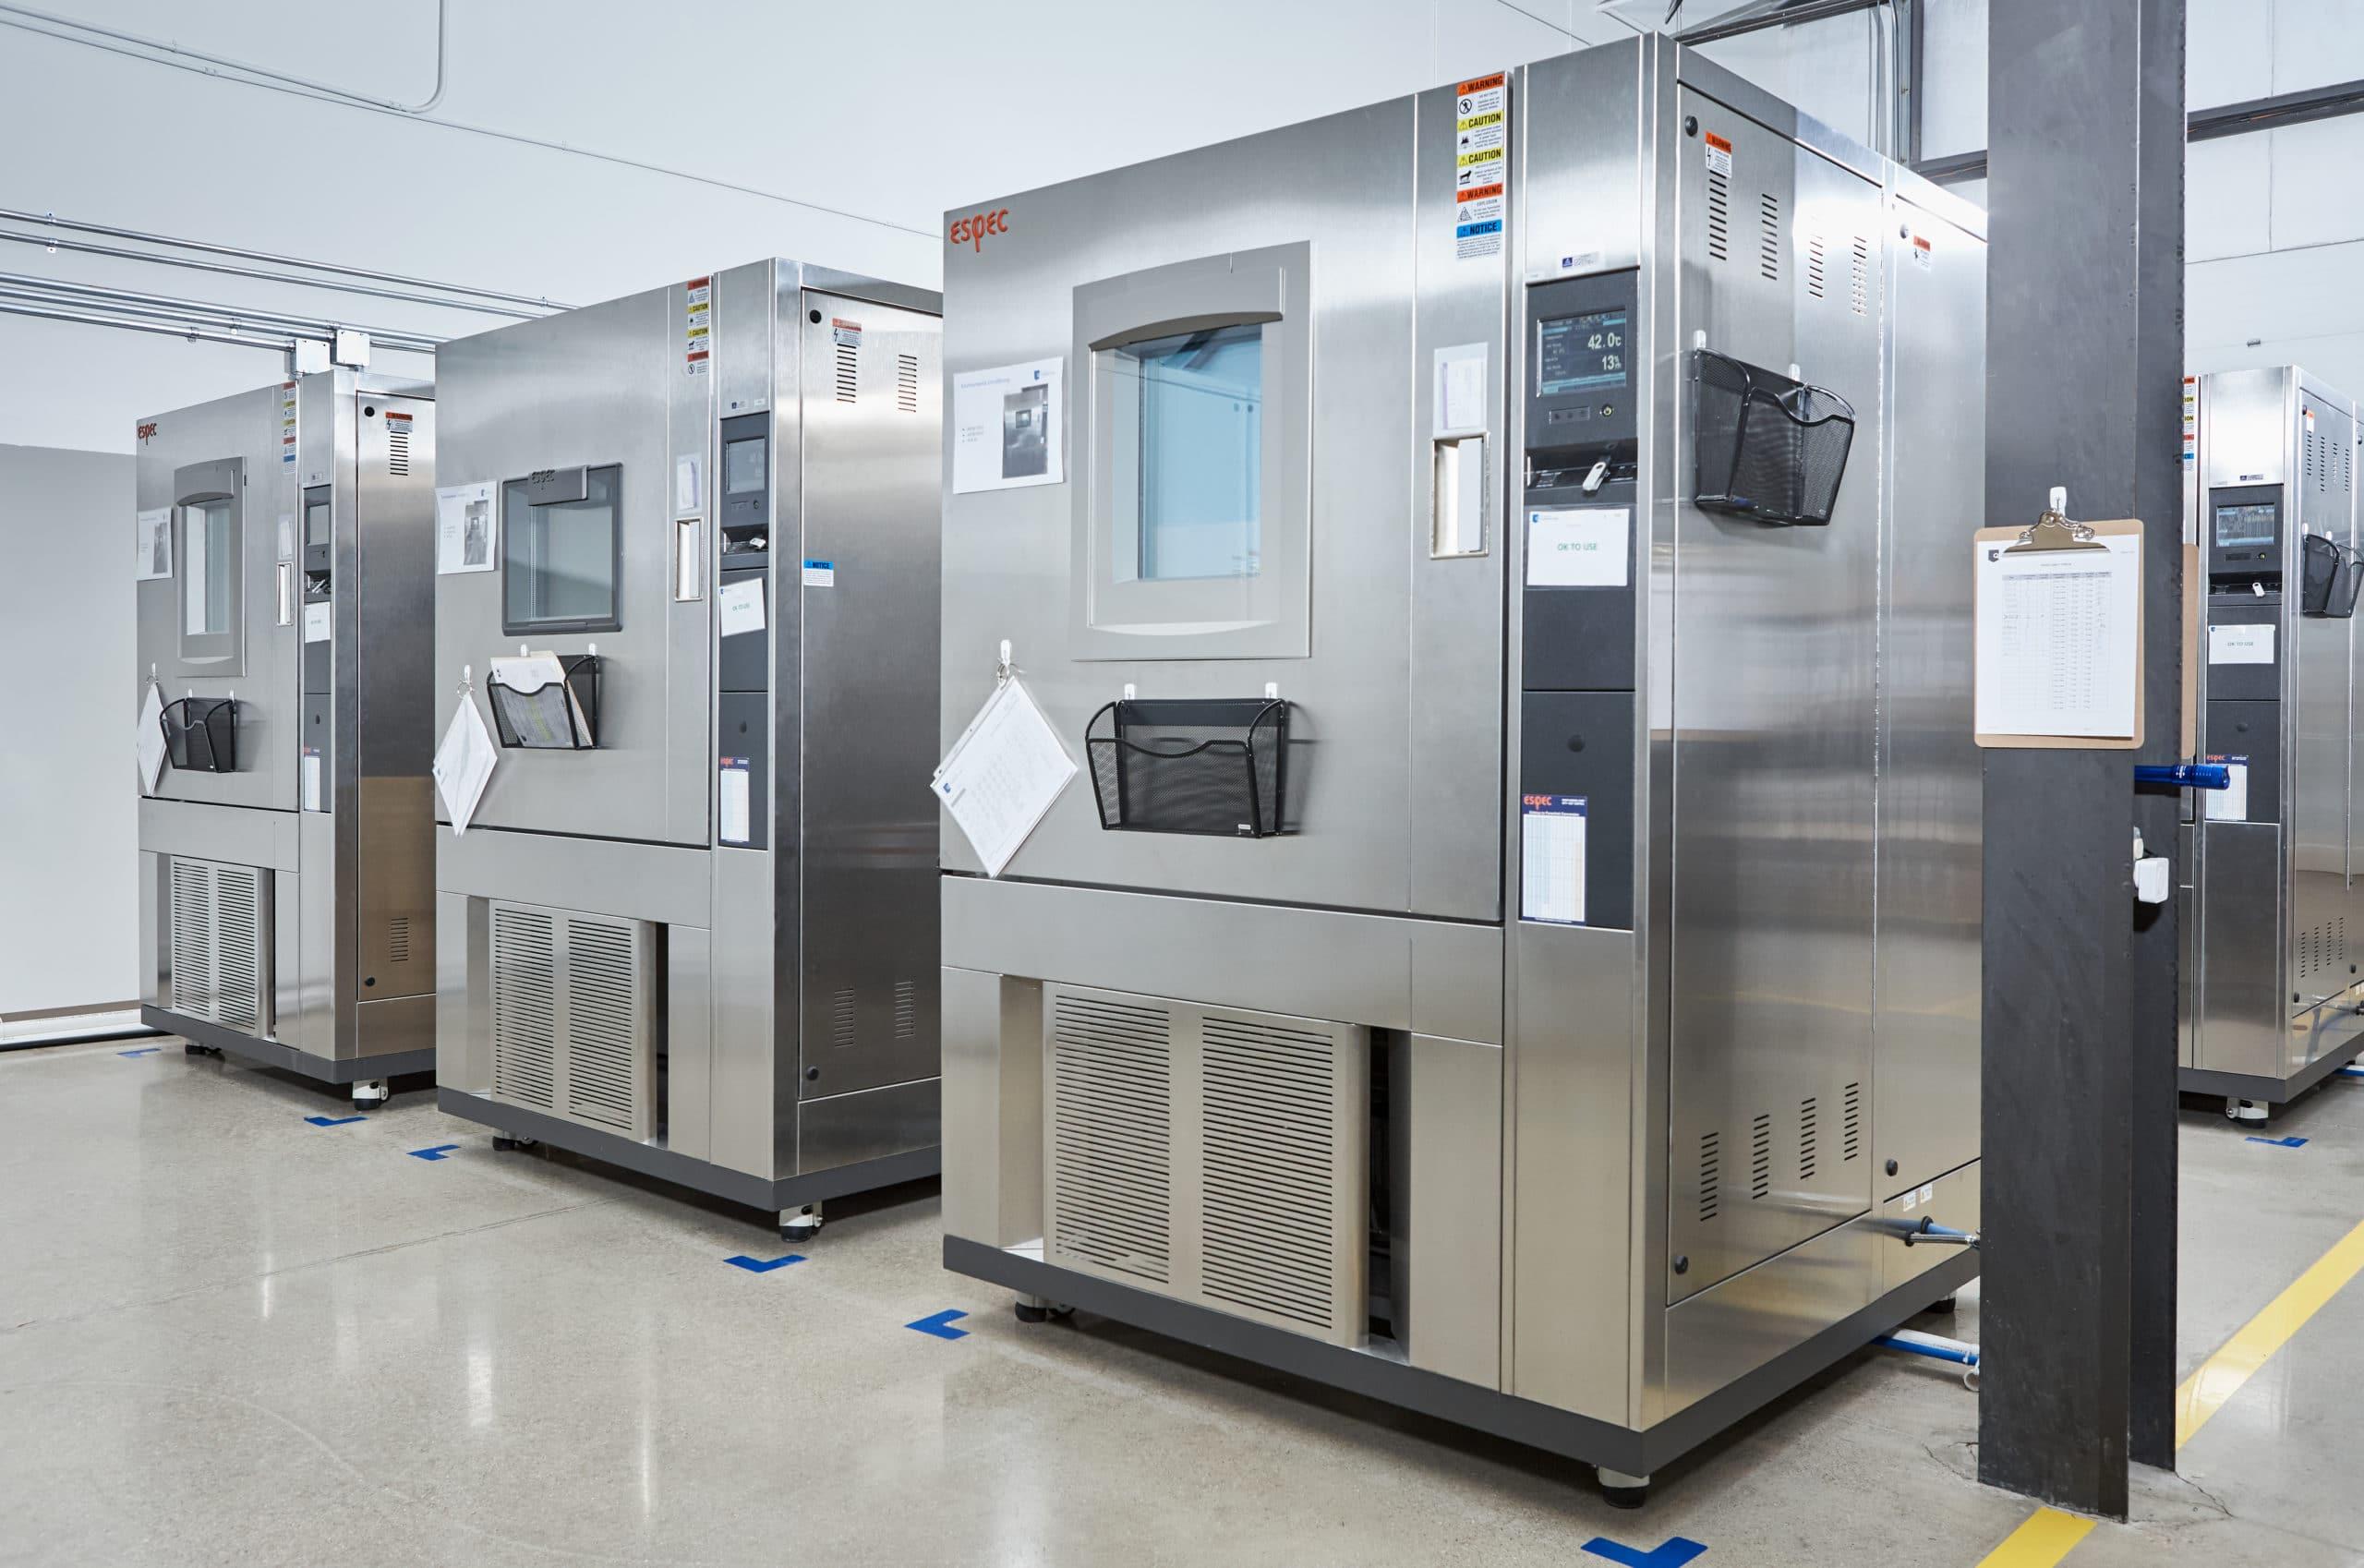 environmental conditioning equipment